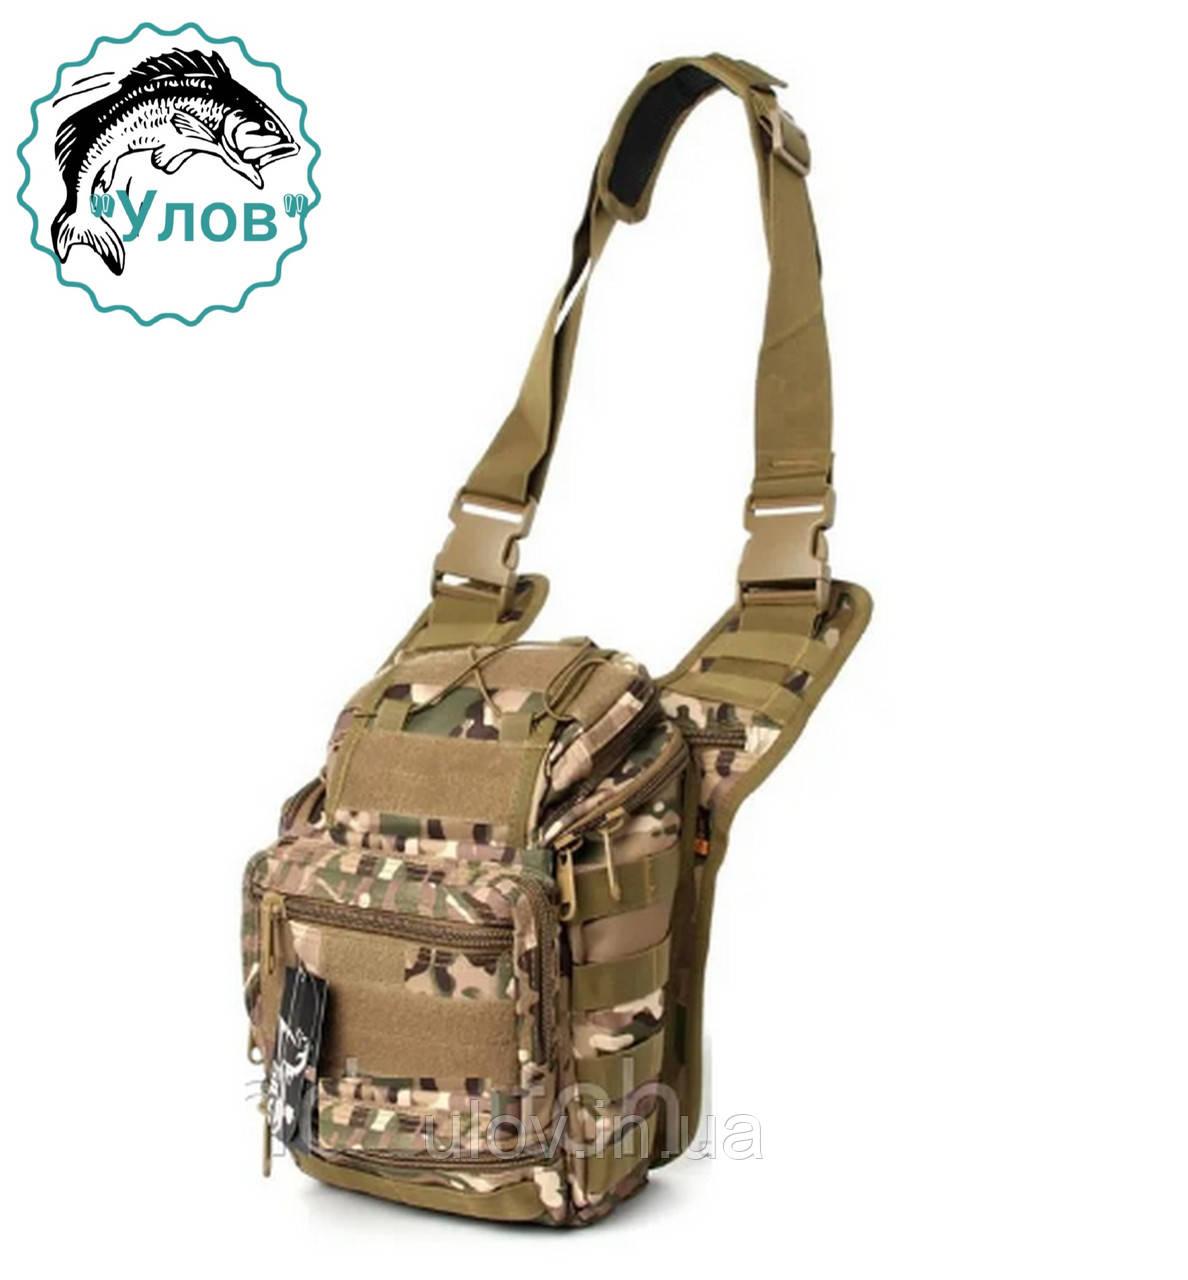 Рюкзак-сумка Silver Knight Мультикам RT-803 20л